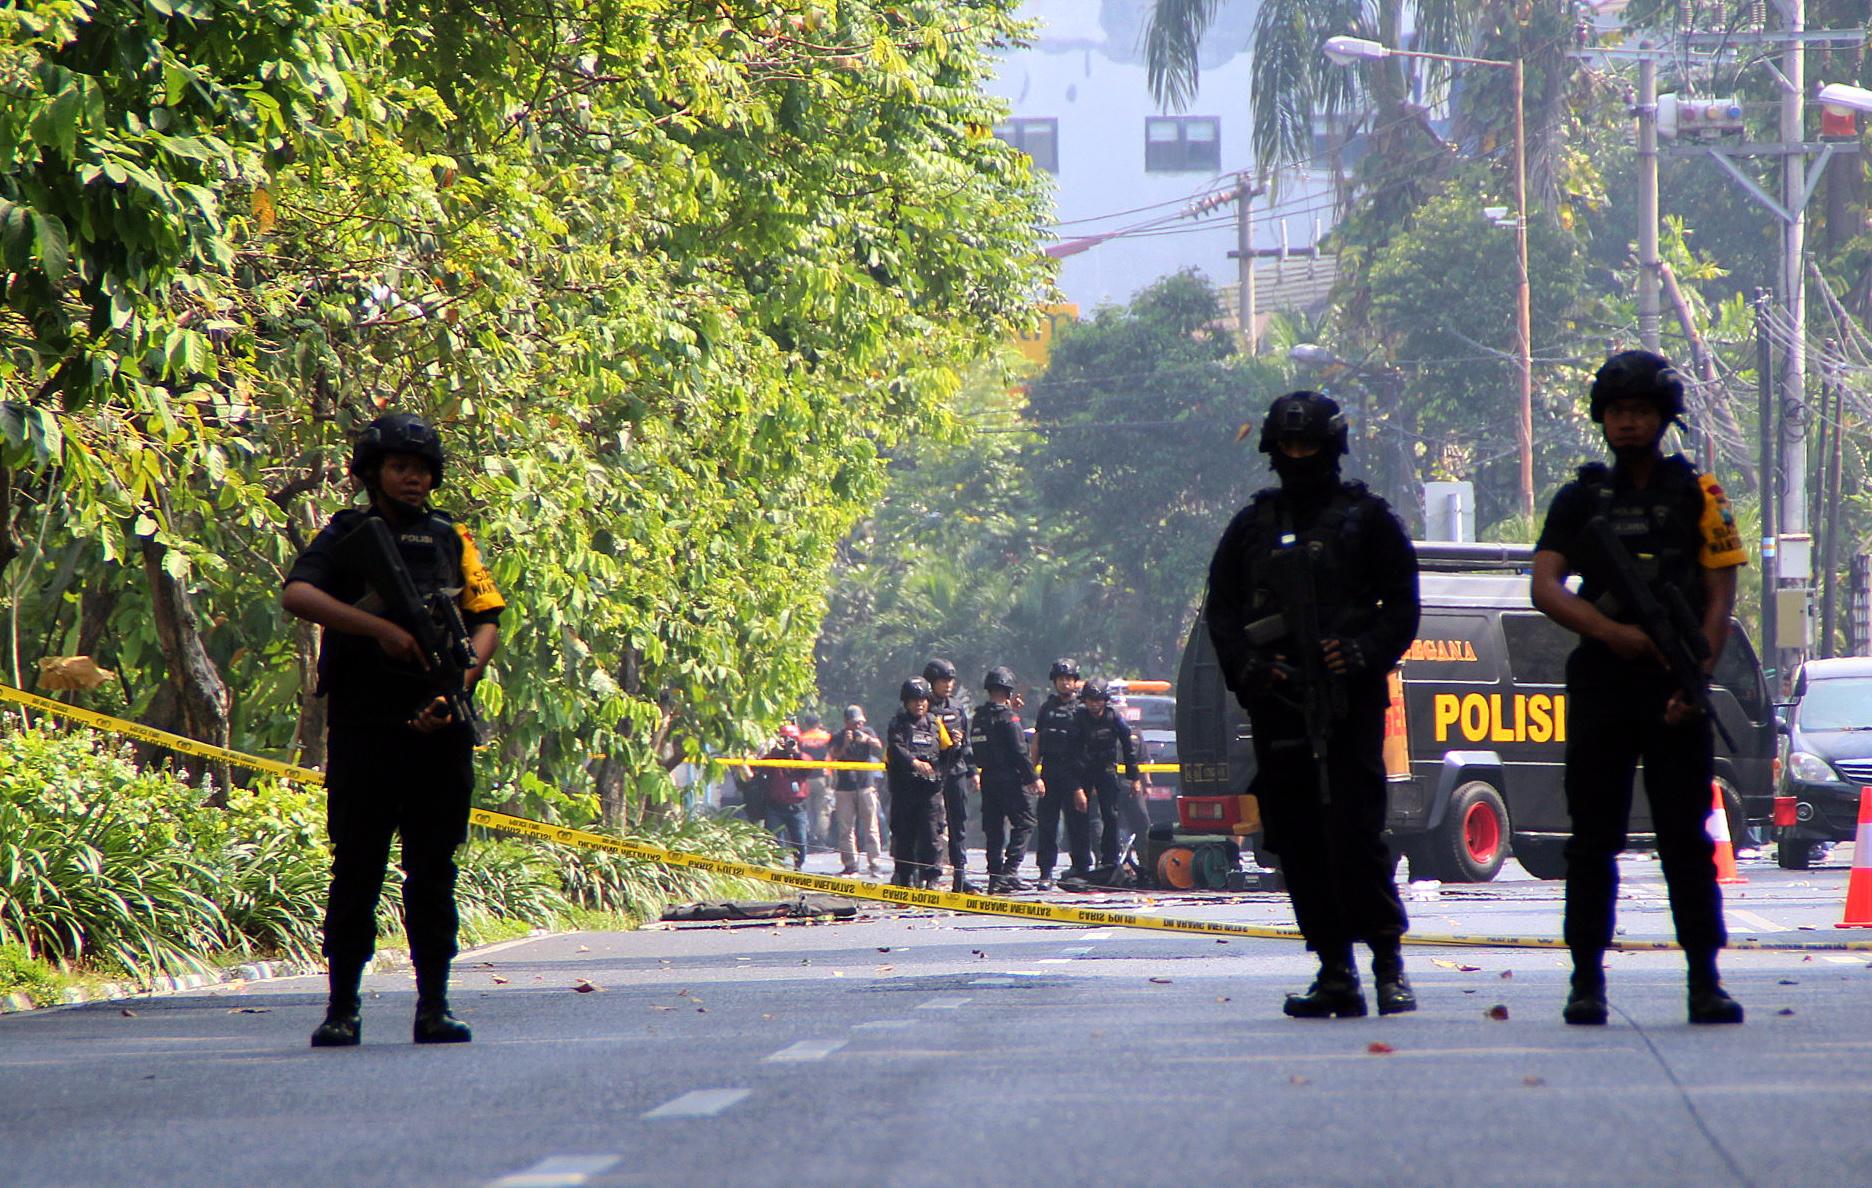 INDONEZIJA Šesteročlana obitelj samoubilačkih bombaša nadahnutih IS-om napala tri crkve